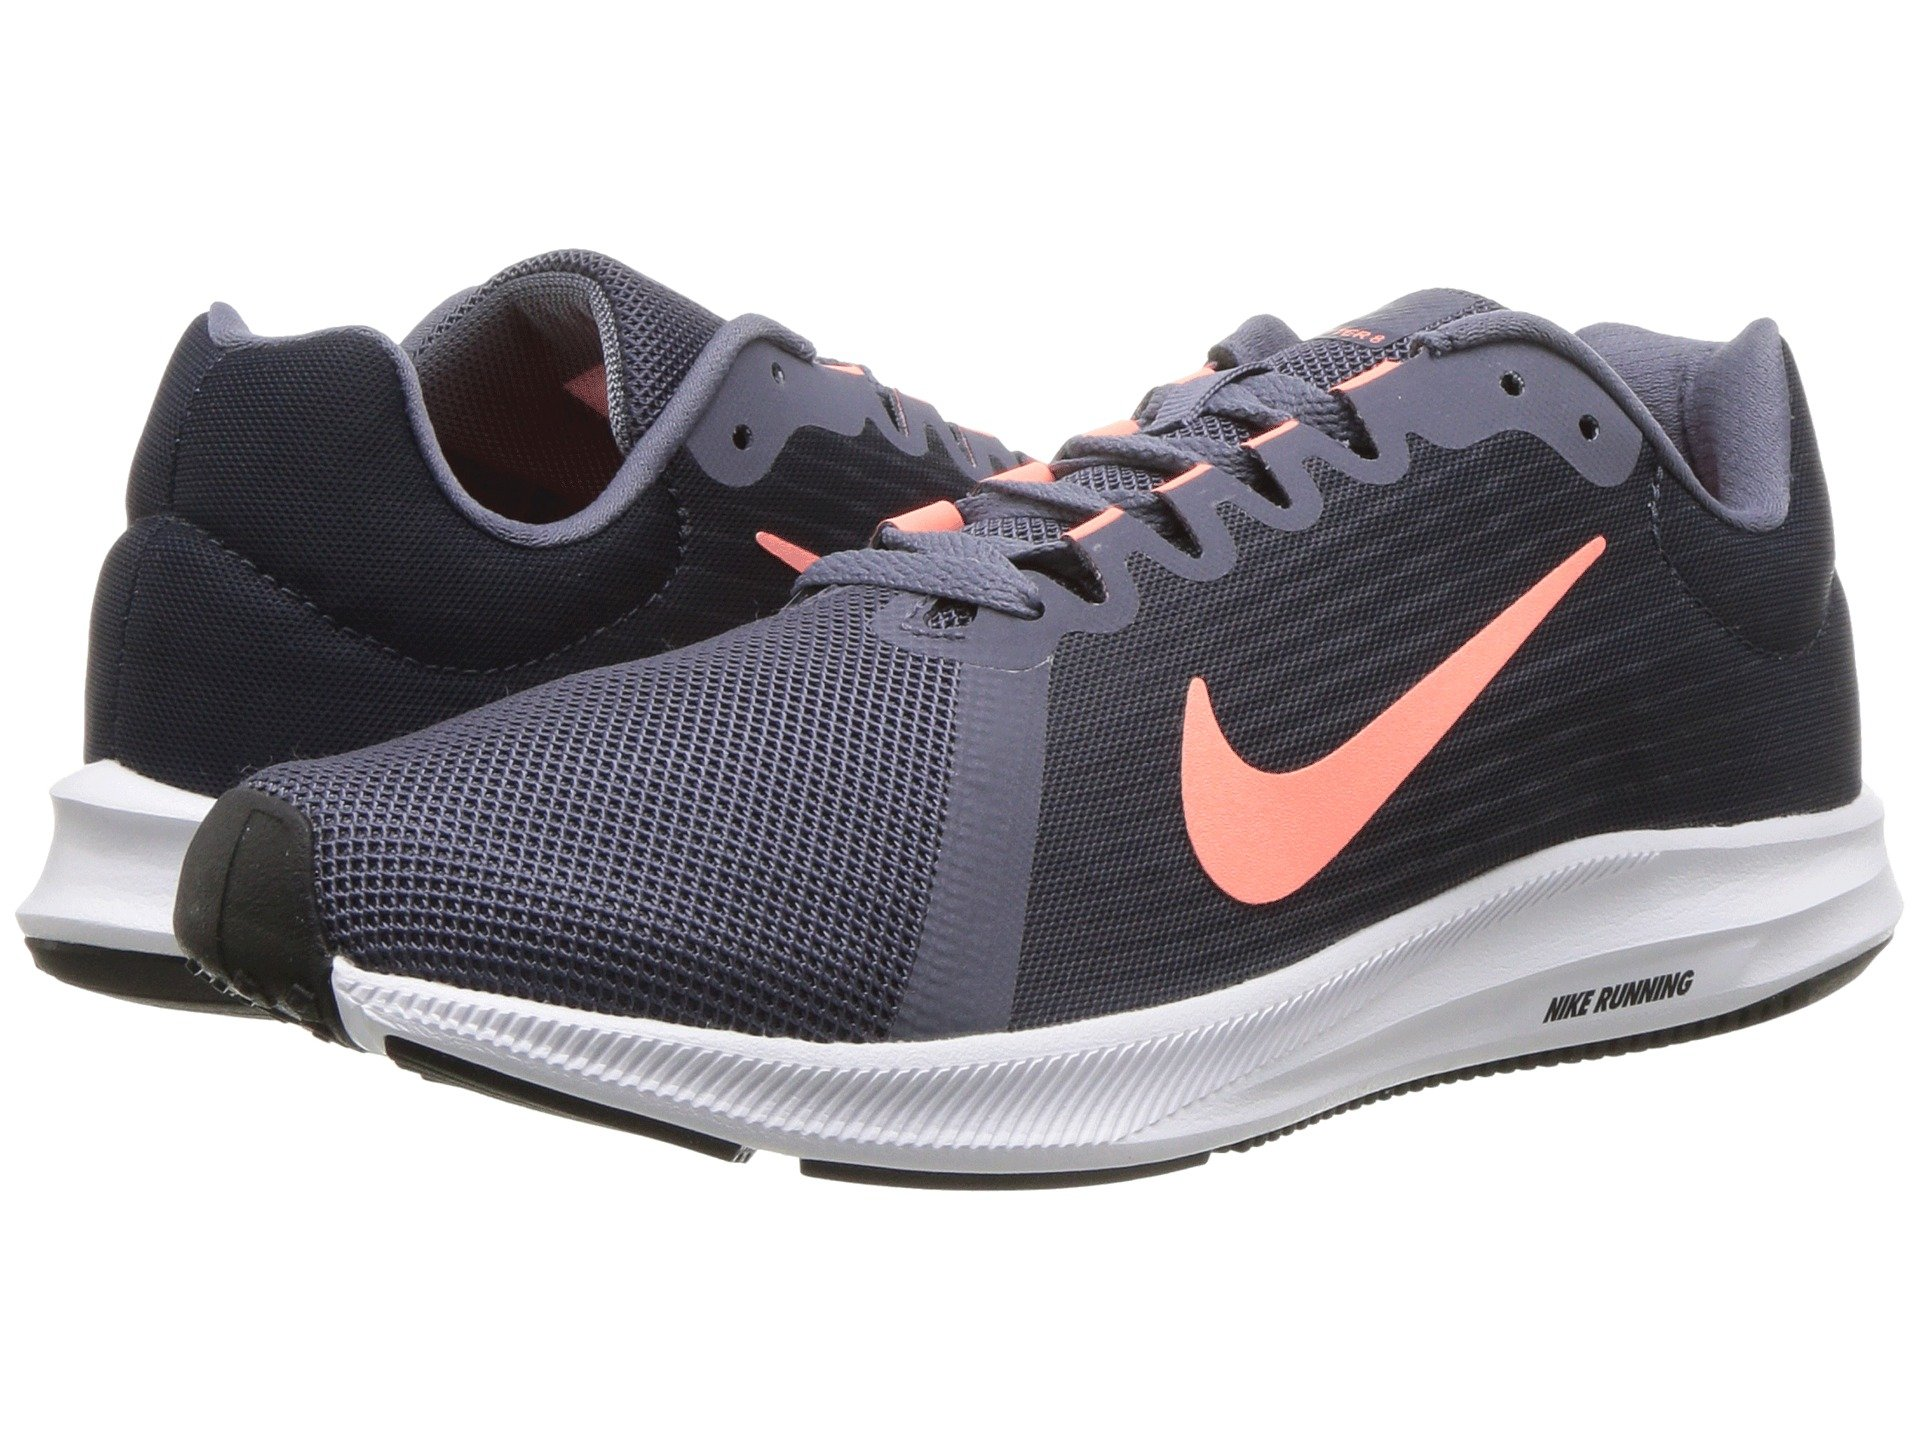 1f1e20609 Nike Roshe Jogging Sneakers